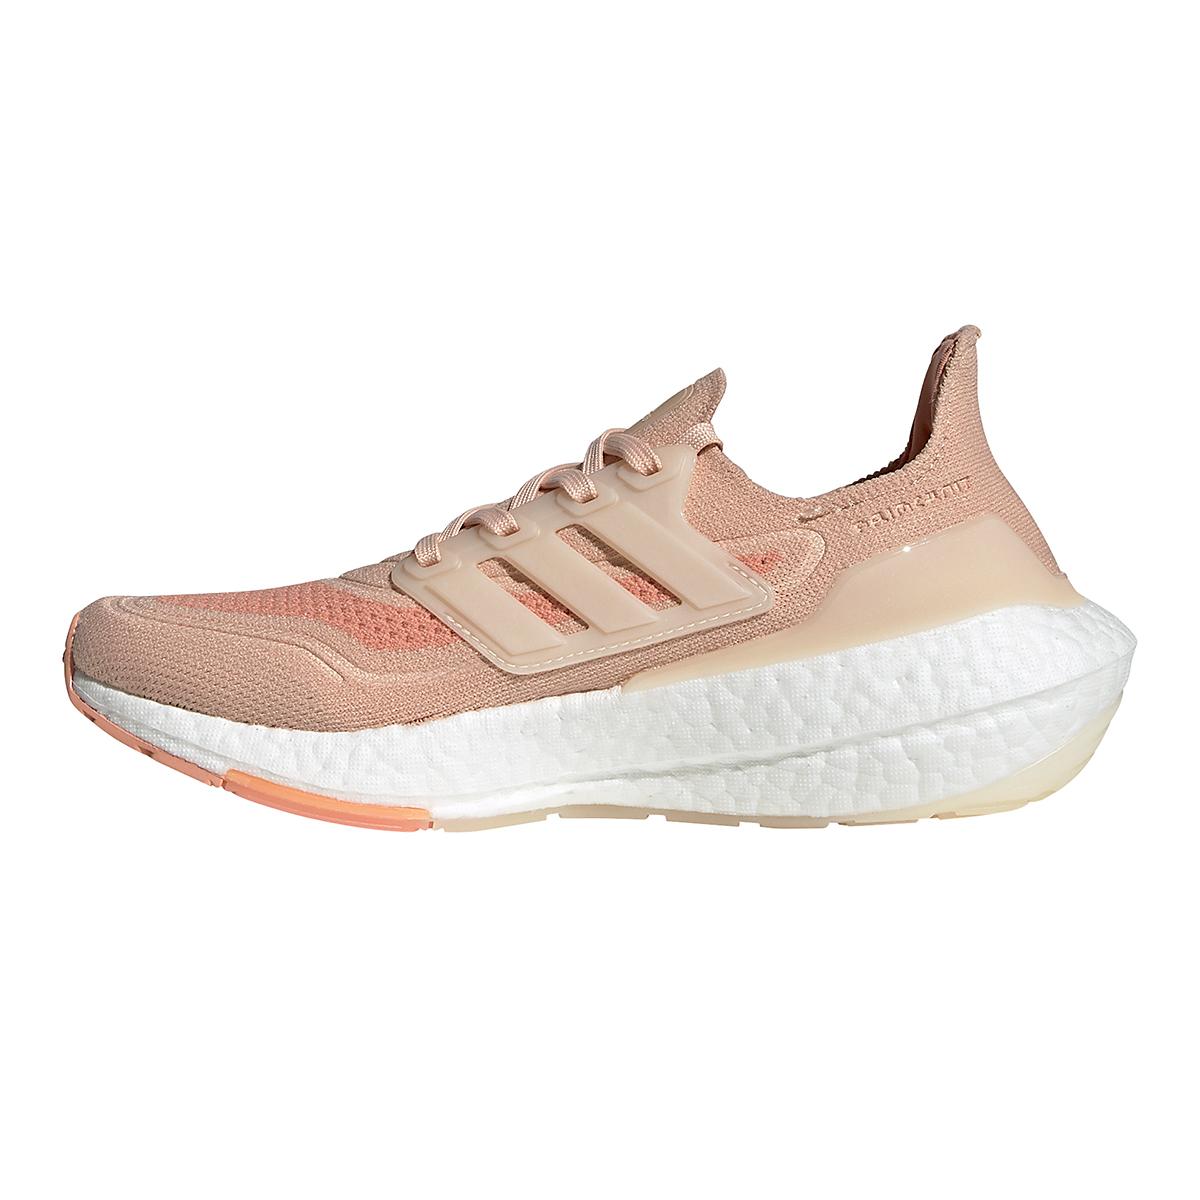 Women's Adidas Ultraboost 21 Running Shoe - Color: Halo Blush/Wonder White/Ambient Blush - Size: 5 - Width: Regular, Halo Blush/Wonder White/Ambient Blush, large, image 2